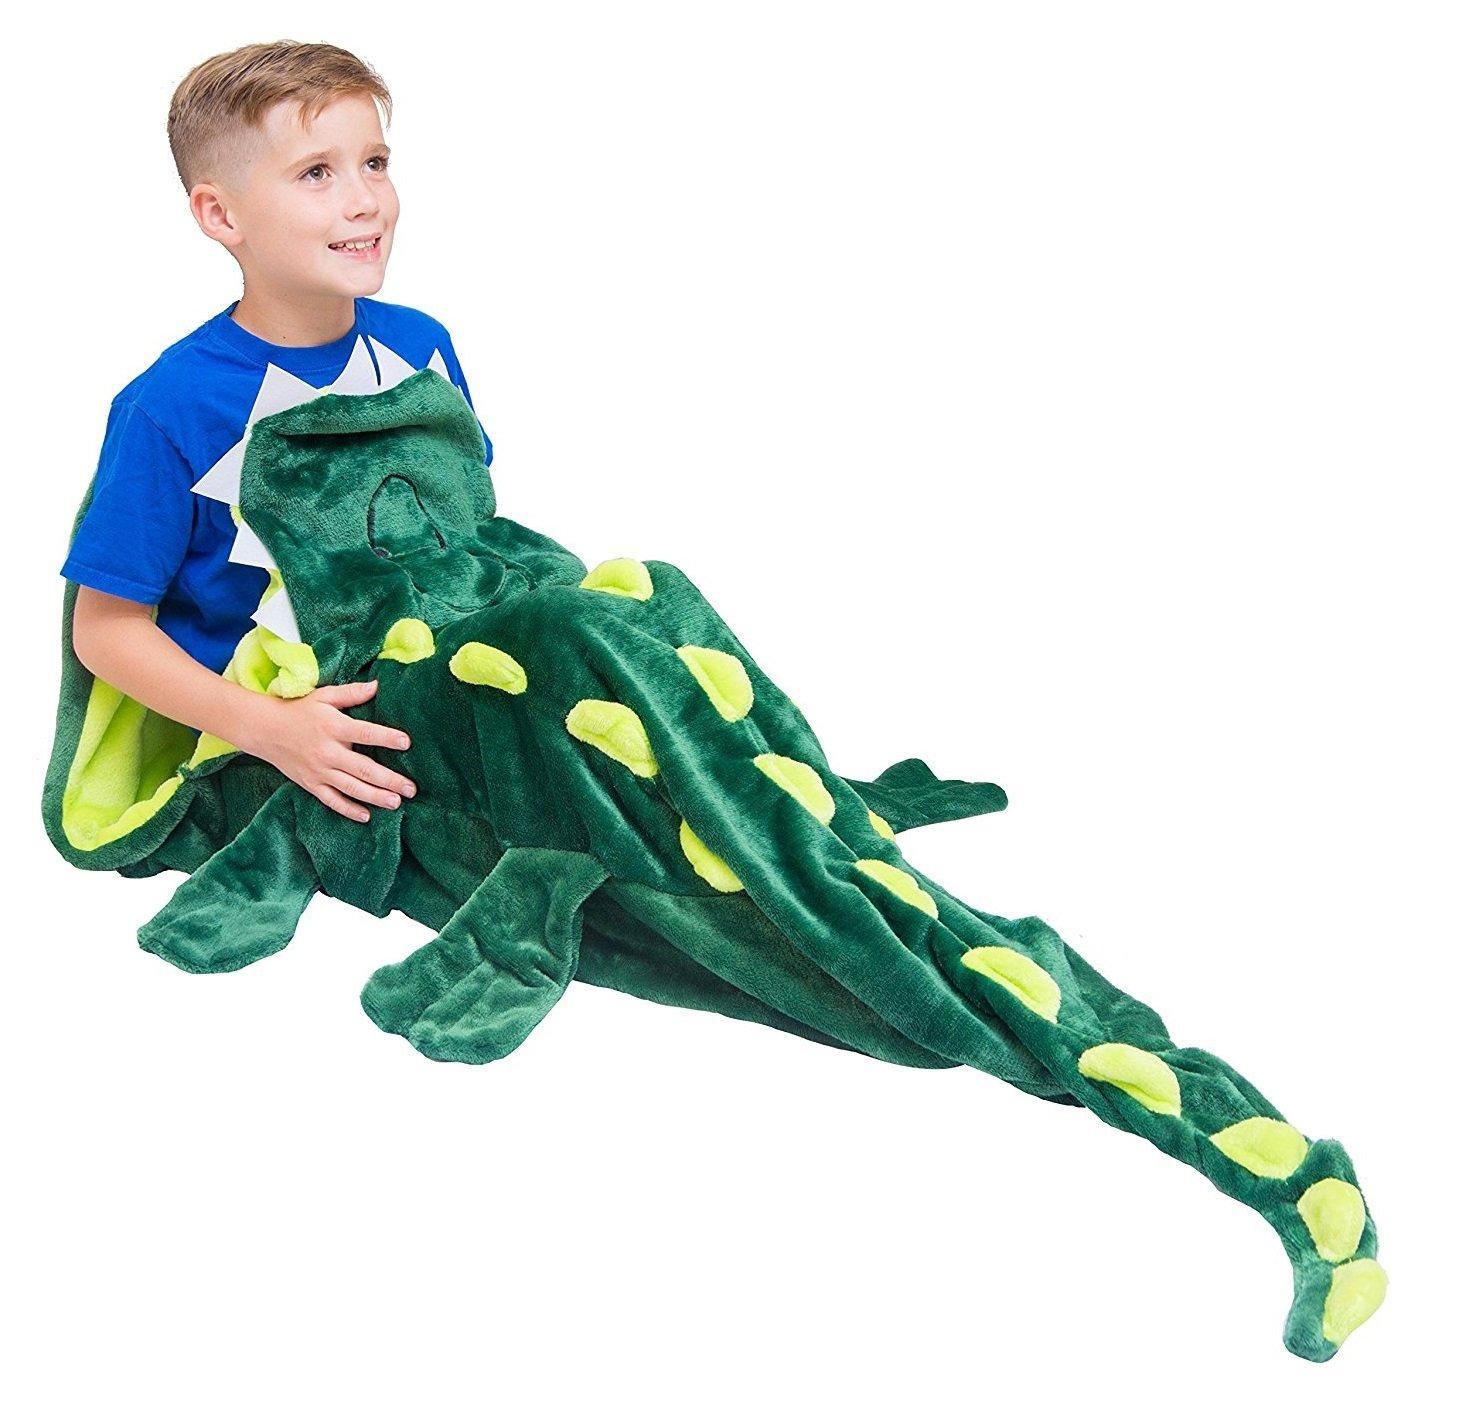 fd6f80b479cb Amazon.com  Cozy Crocodile Blanket For Children